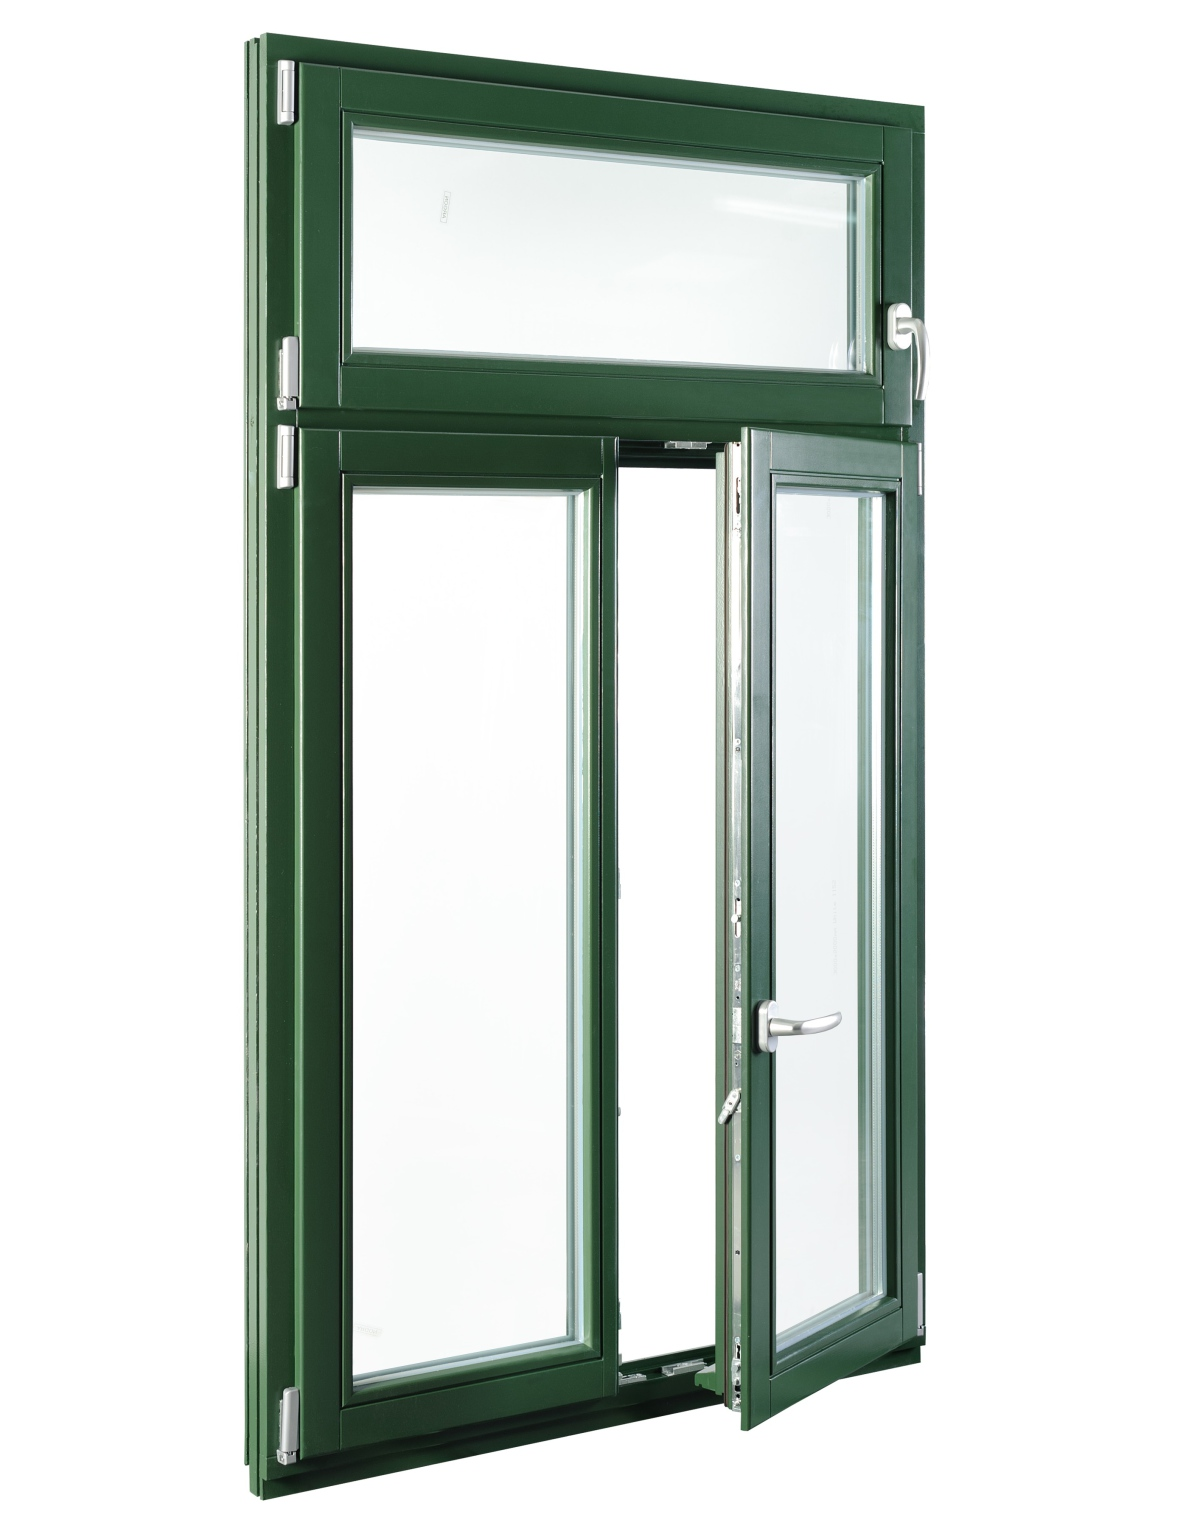 Bevorzugt Fenster: PVC-, Alu-, Holz- oder Kombi? - BundesBauBlatt LO92